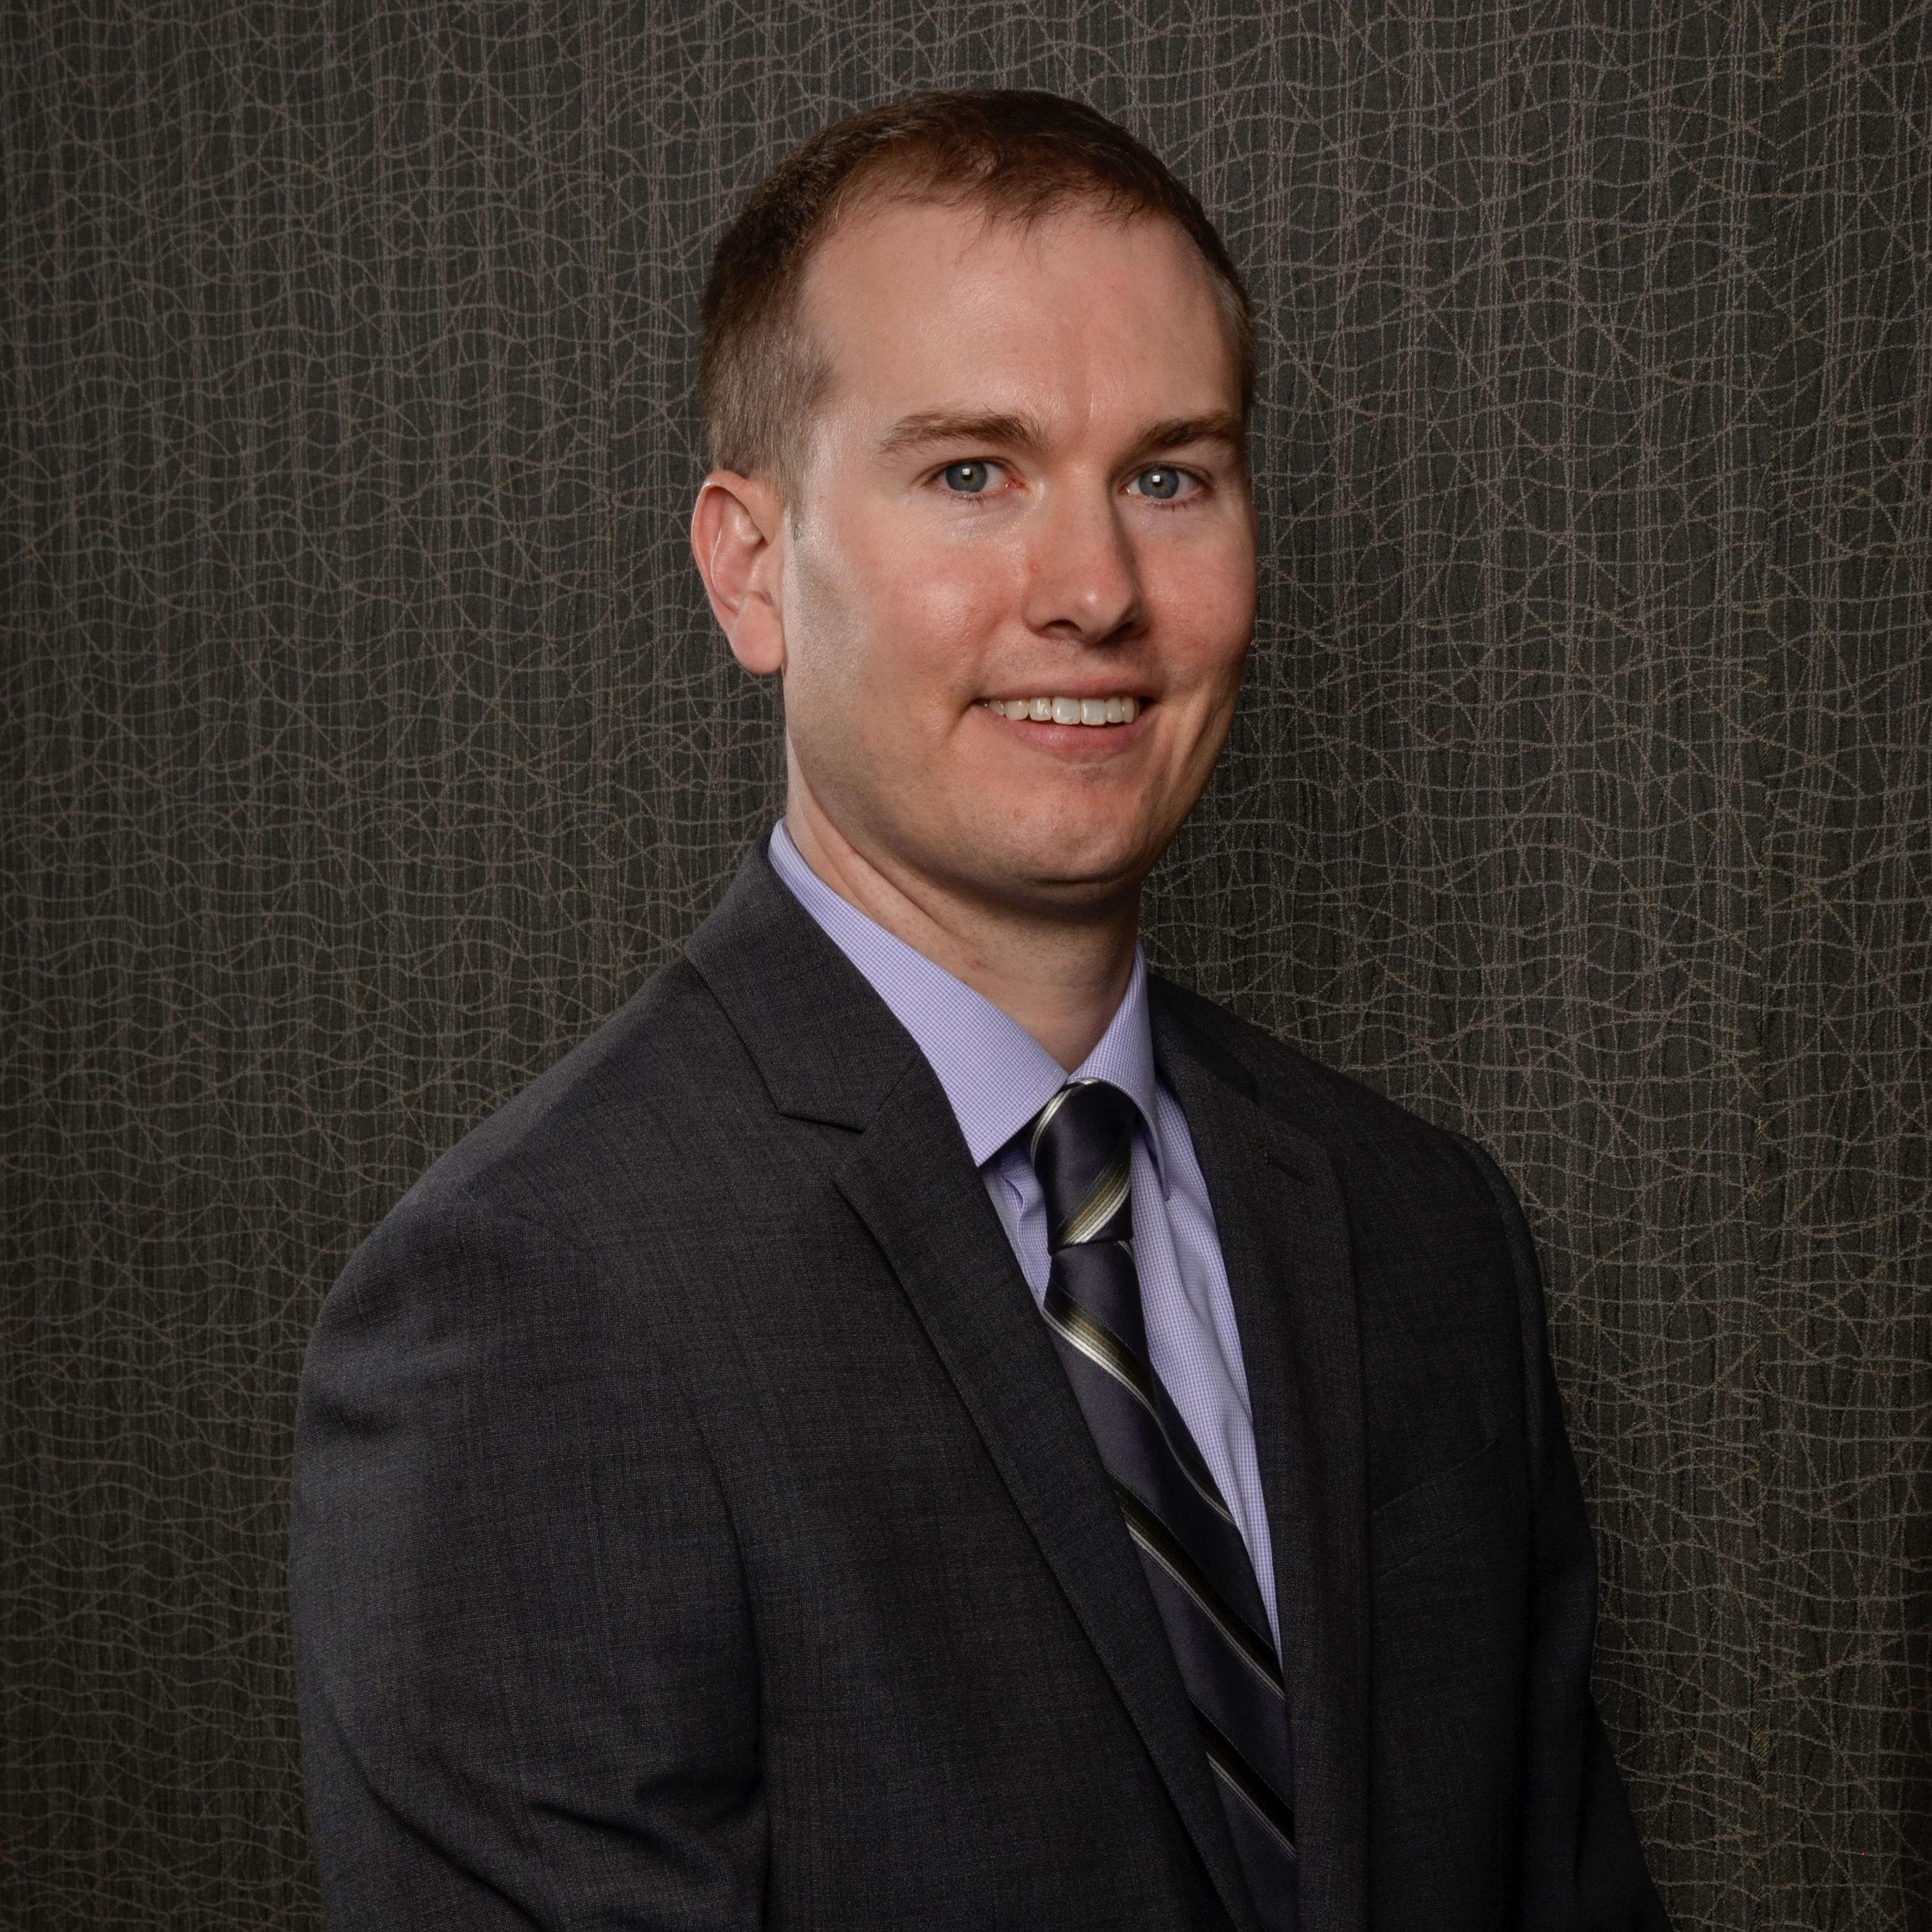 Andrew J. Givens, CFA  Senior Analyst  andrew@firstfiduciary.com